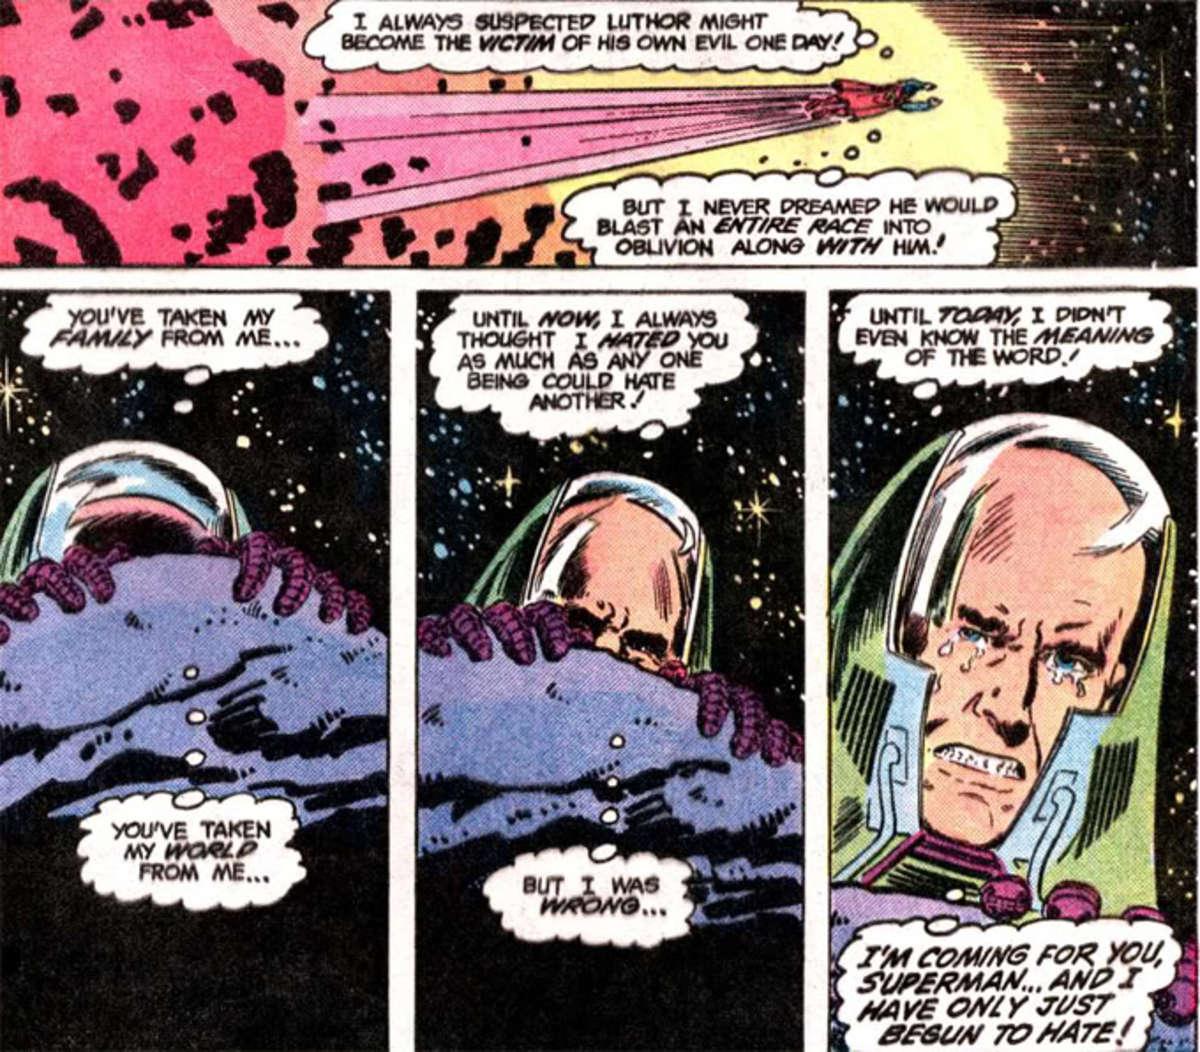 Luthor destroys Lexor and blames Superman